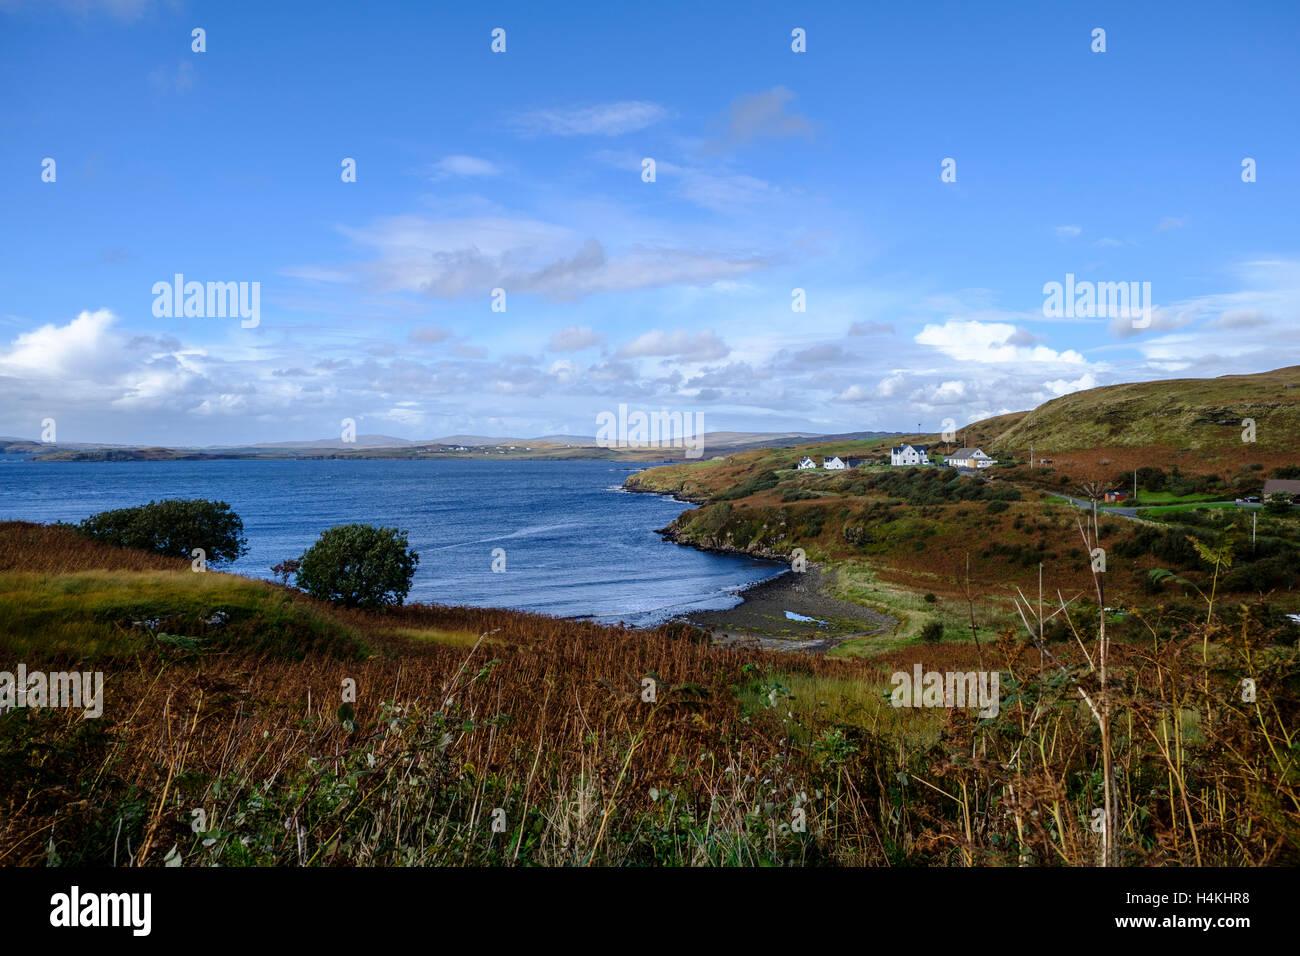 Beautiful remote coastal scenery of Fiskavaig Bay on Isle of Skye Scotland Stock Photo